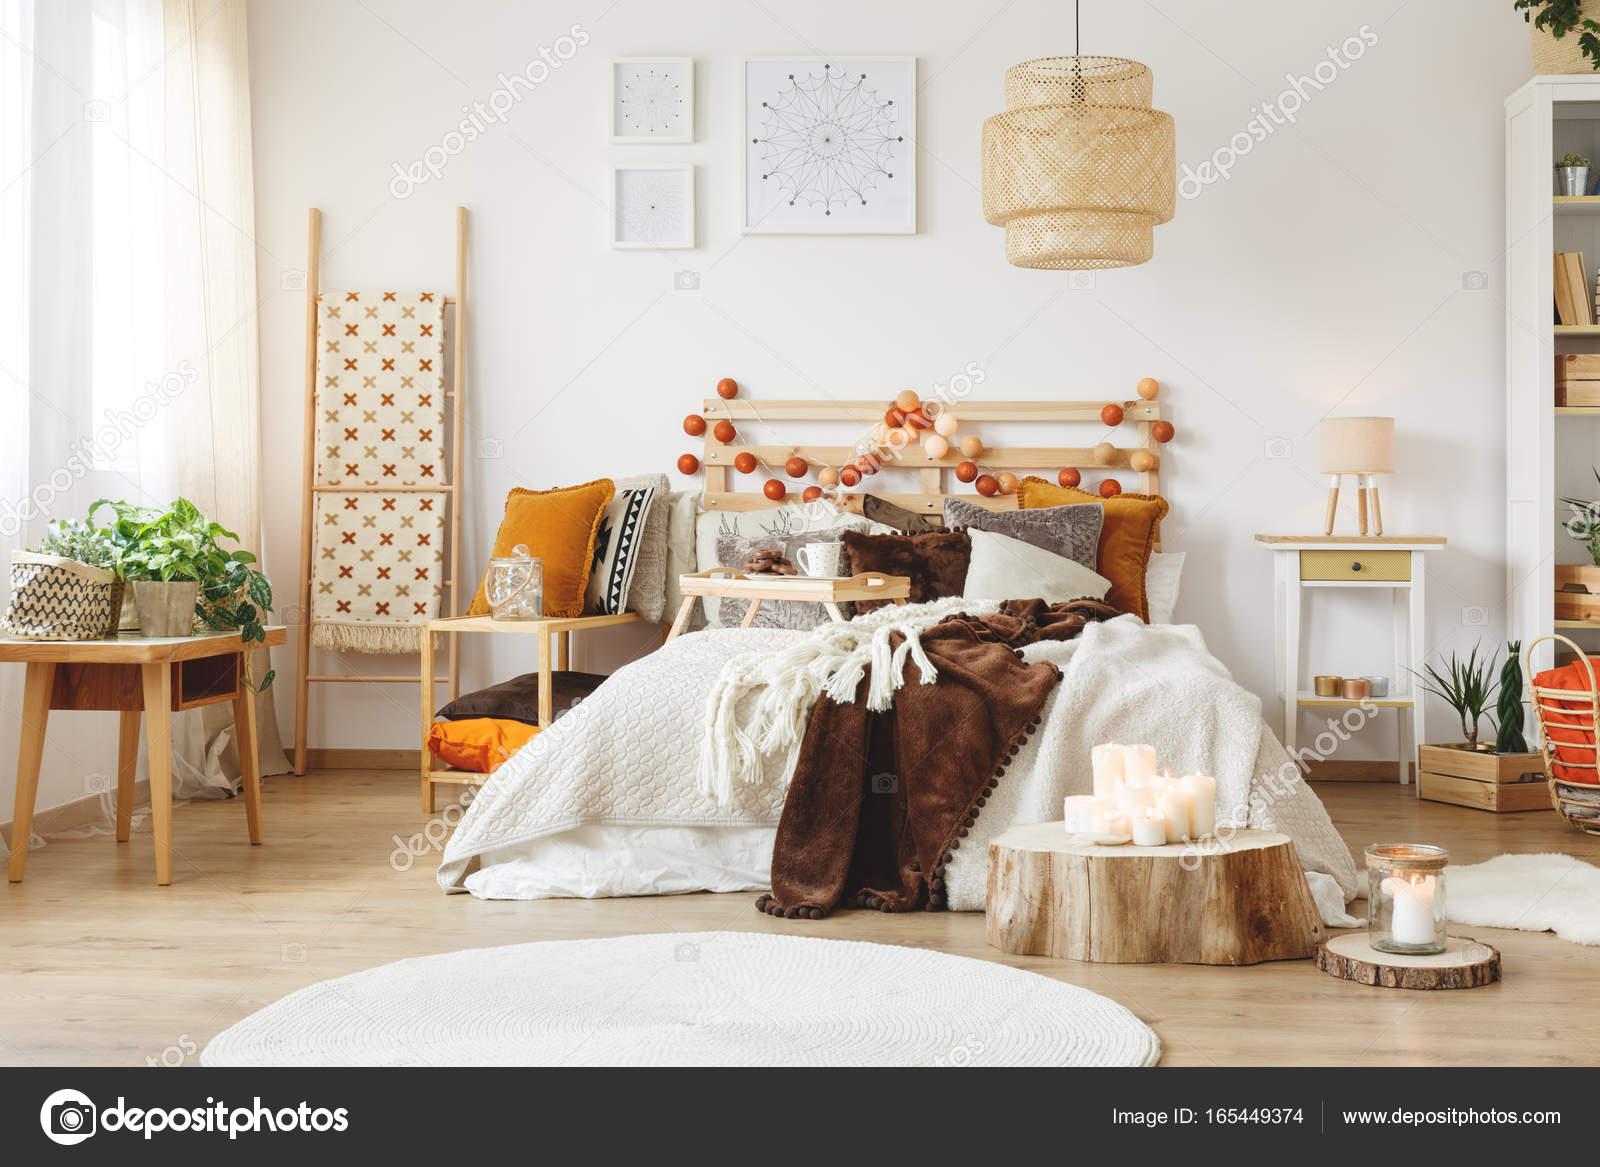 Messy bed in bedroom — Stock Photo © photographee.eu #165449374